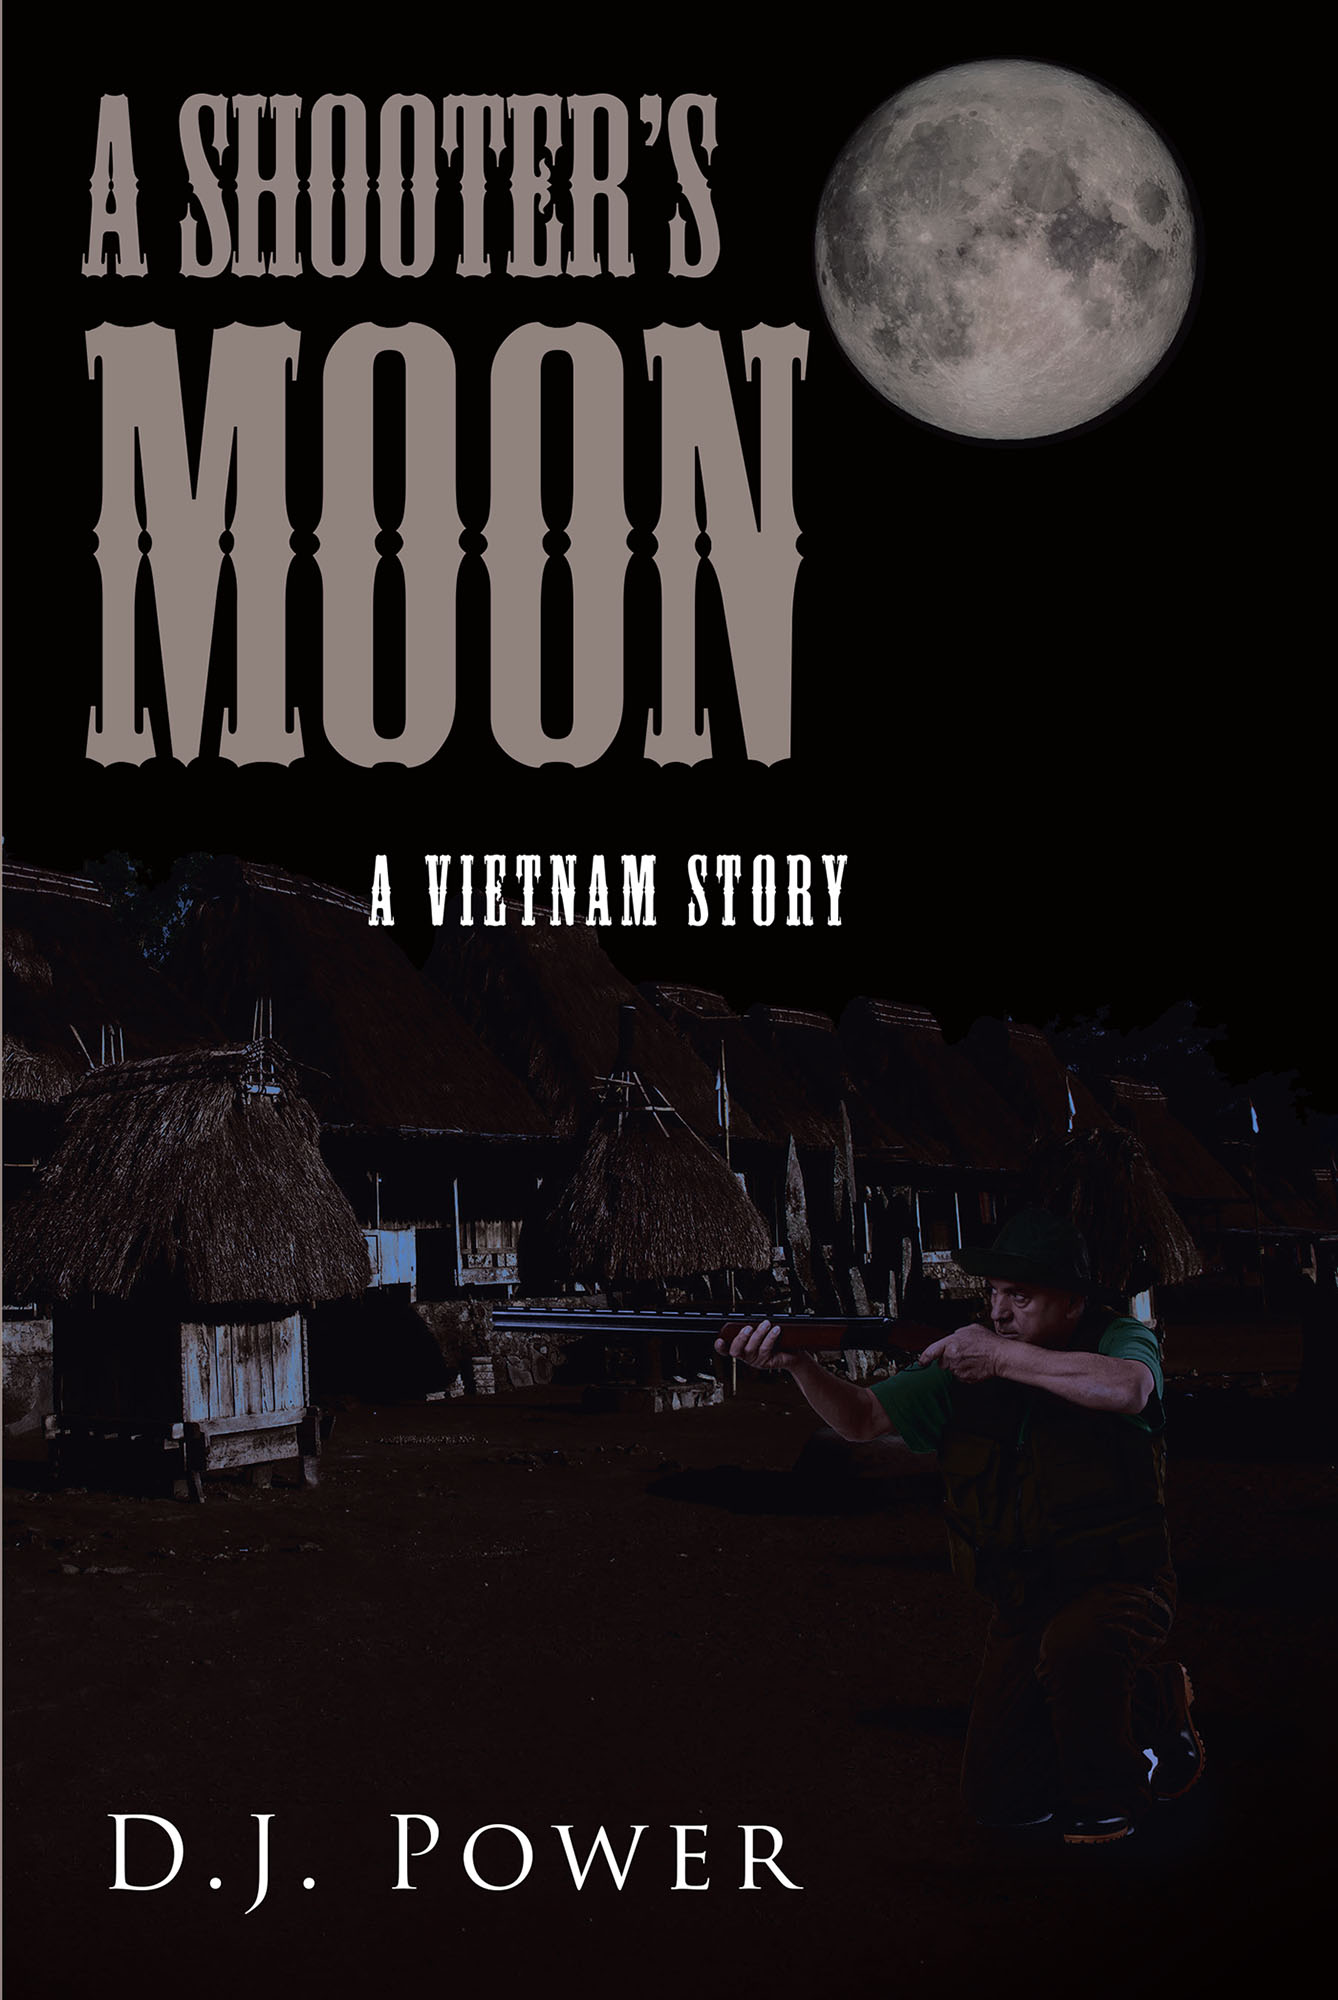 A Shooter's Moon